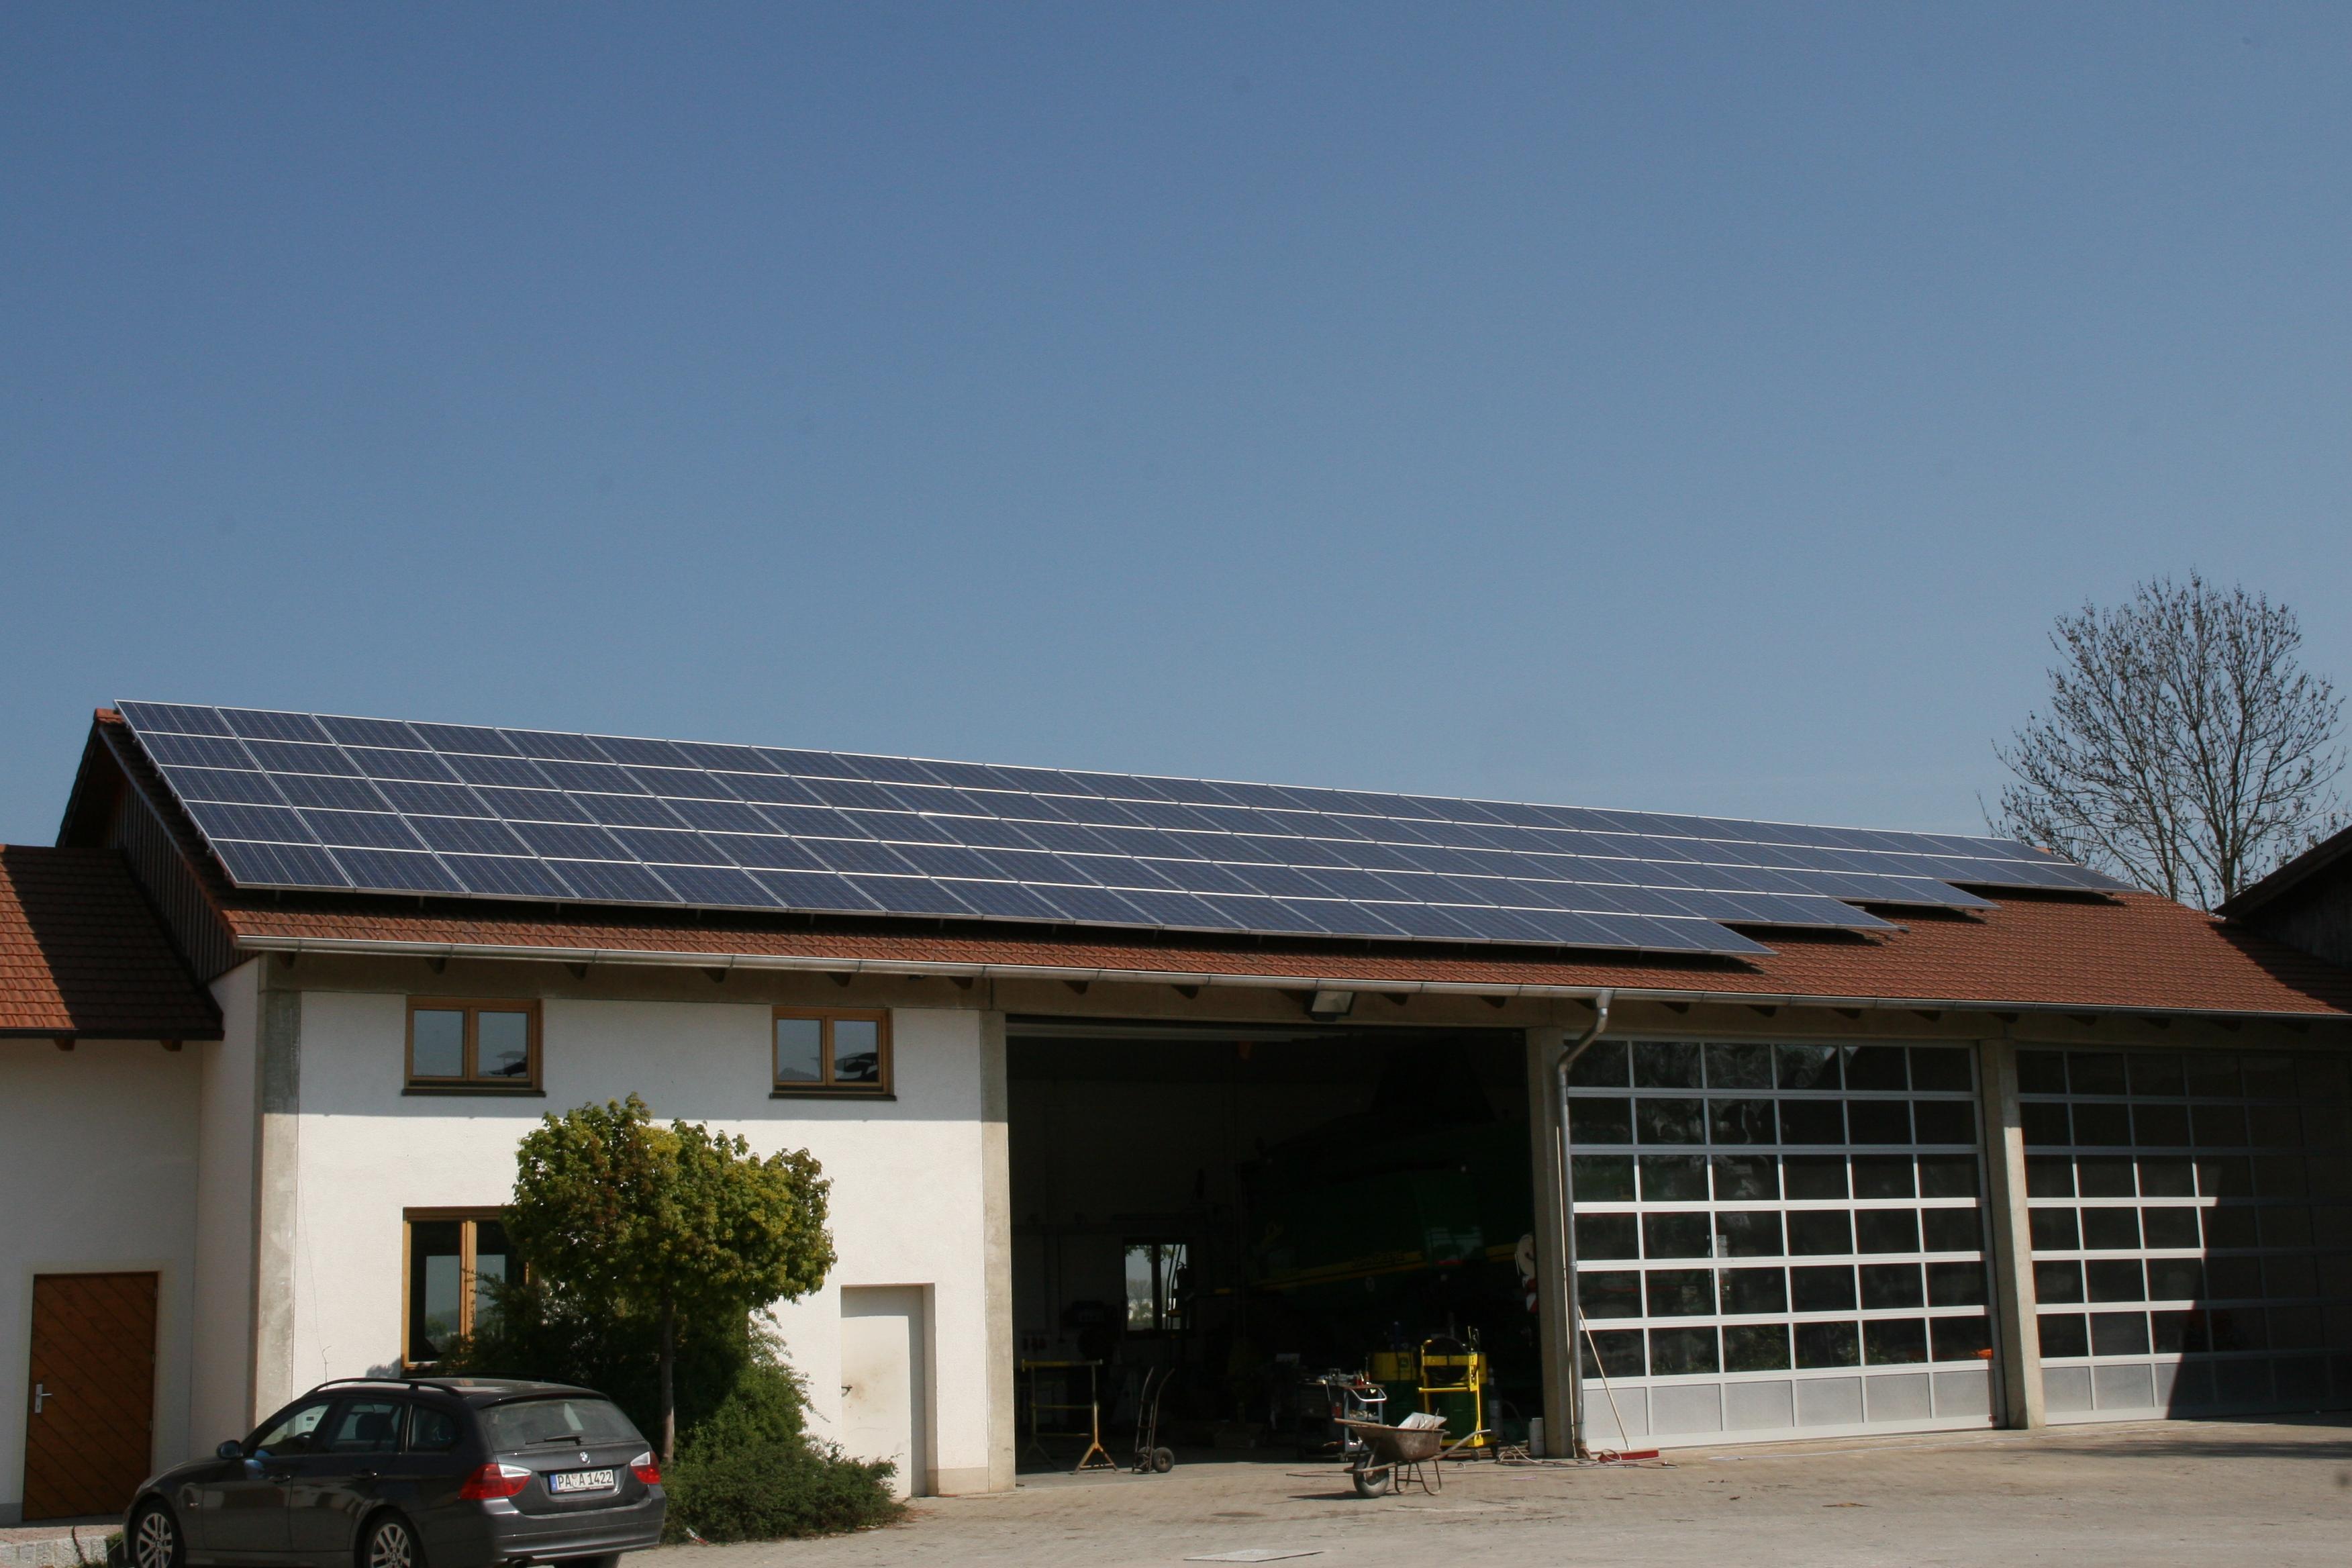 IMG 2753 - Hausdächer